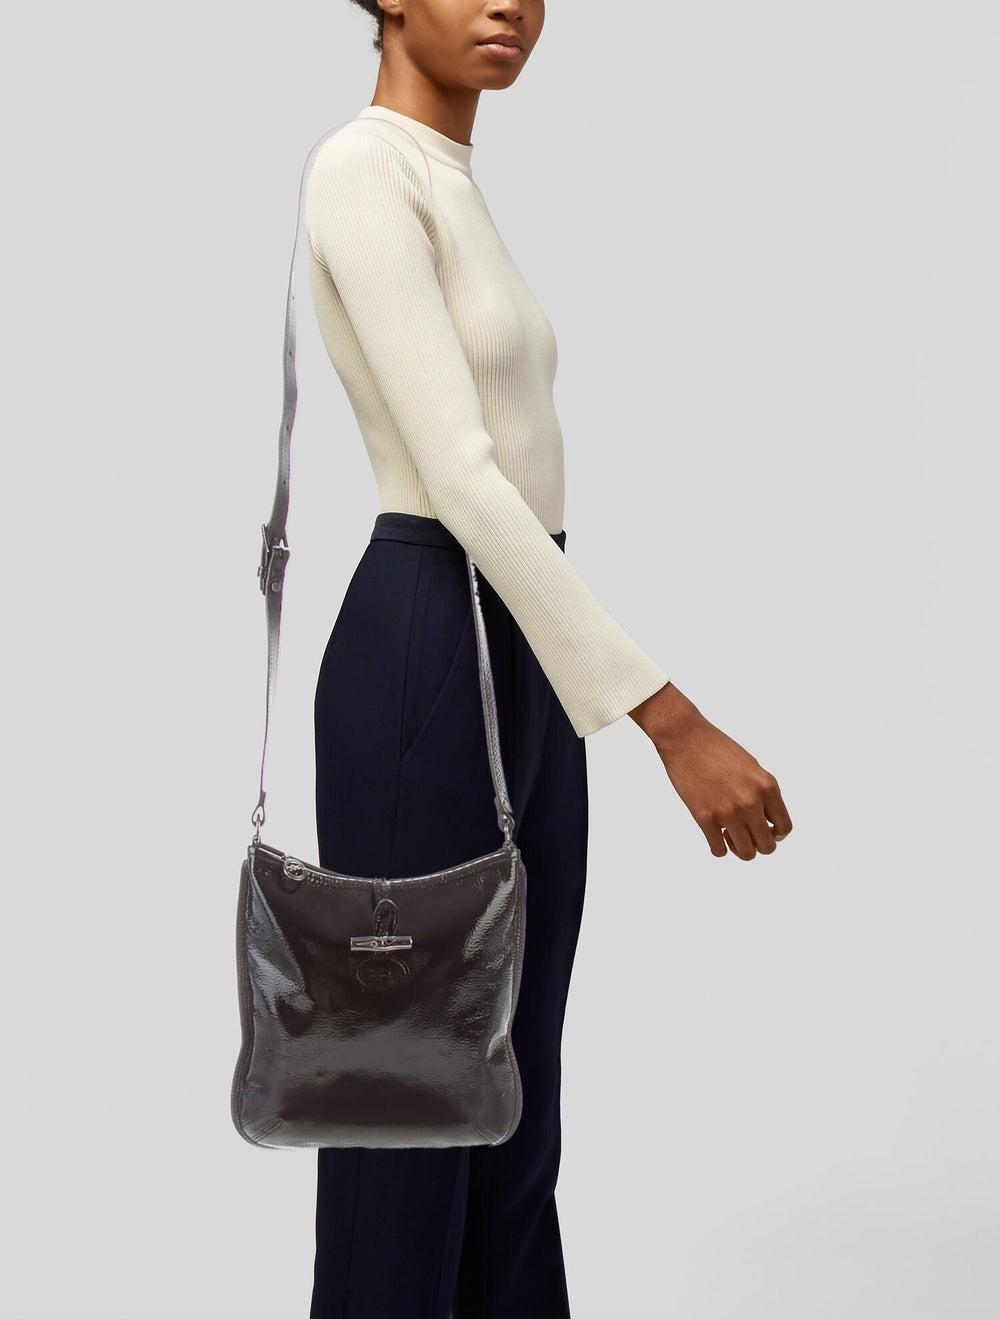 Longchamp Patent Leather Crossbody Bag Black - image 2